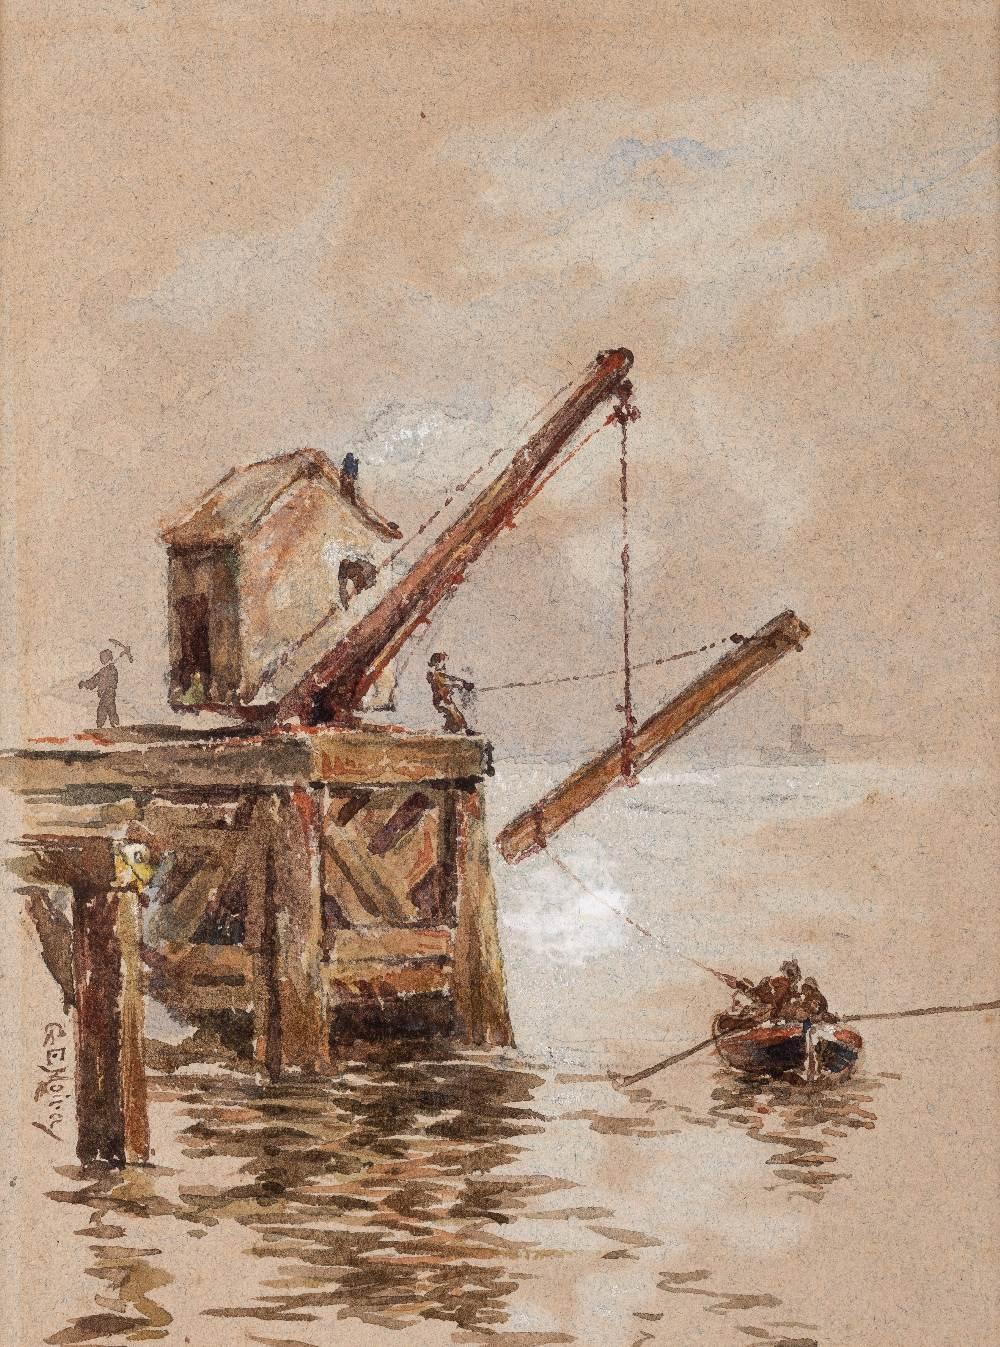 Lot 99 - GERALD EDWARD MOIRA, R.W.S., R.O.I. (1867-1959) A SHIPPING SCENE signed l.l. GE Moira watercolour